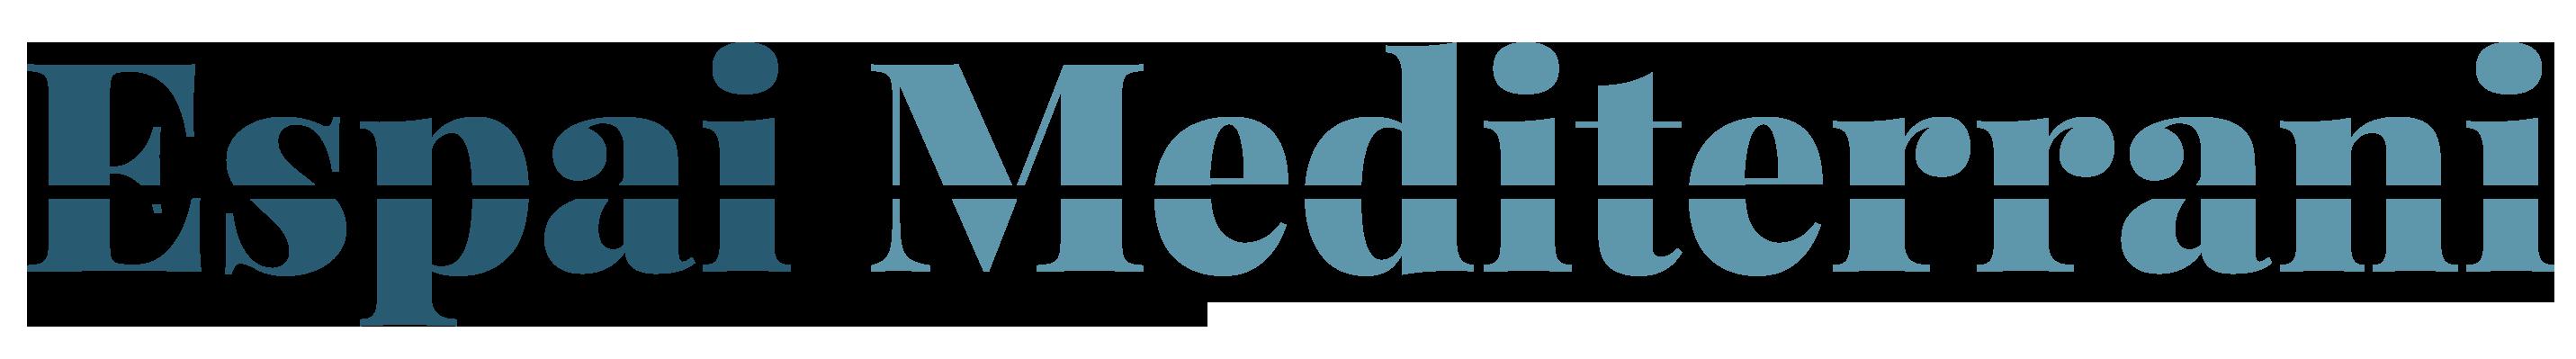 espai-mediterrani-logo